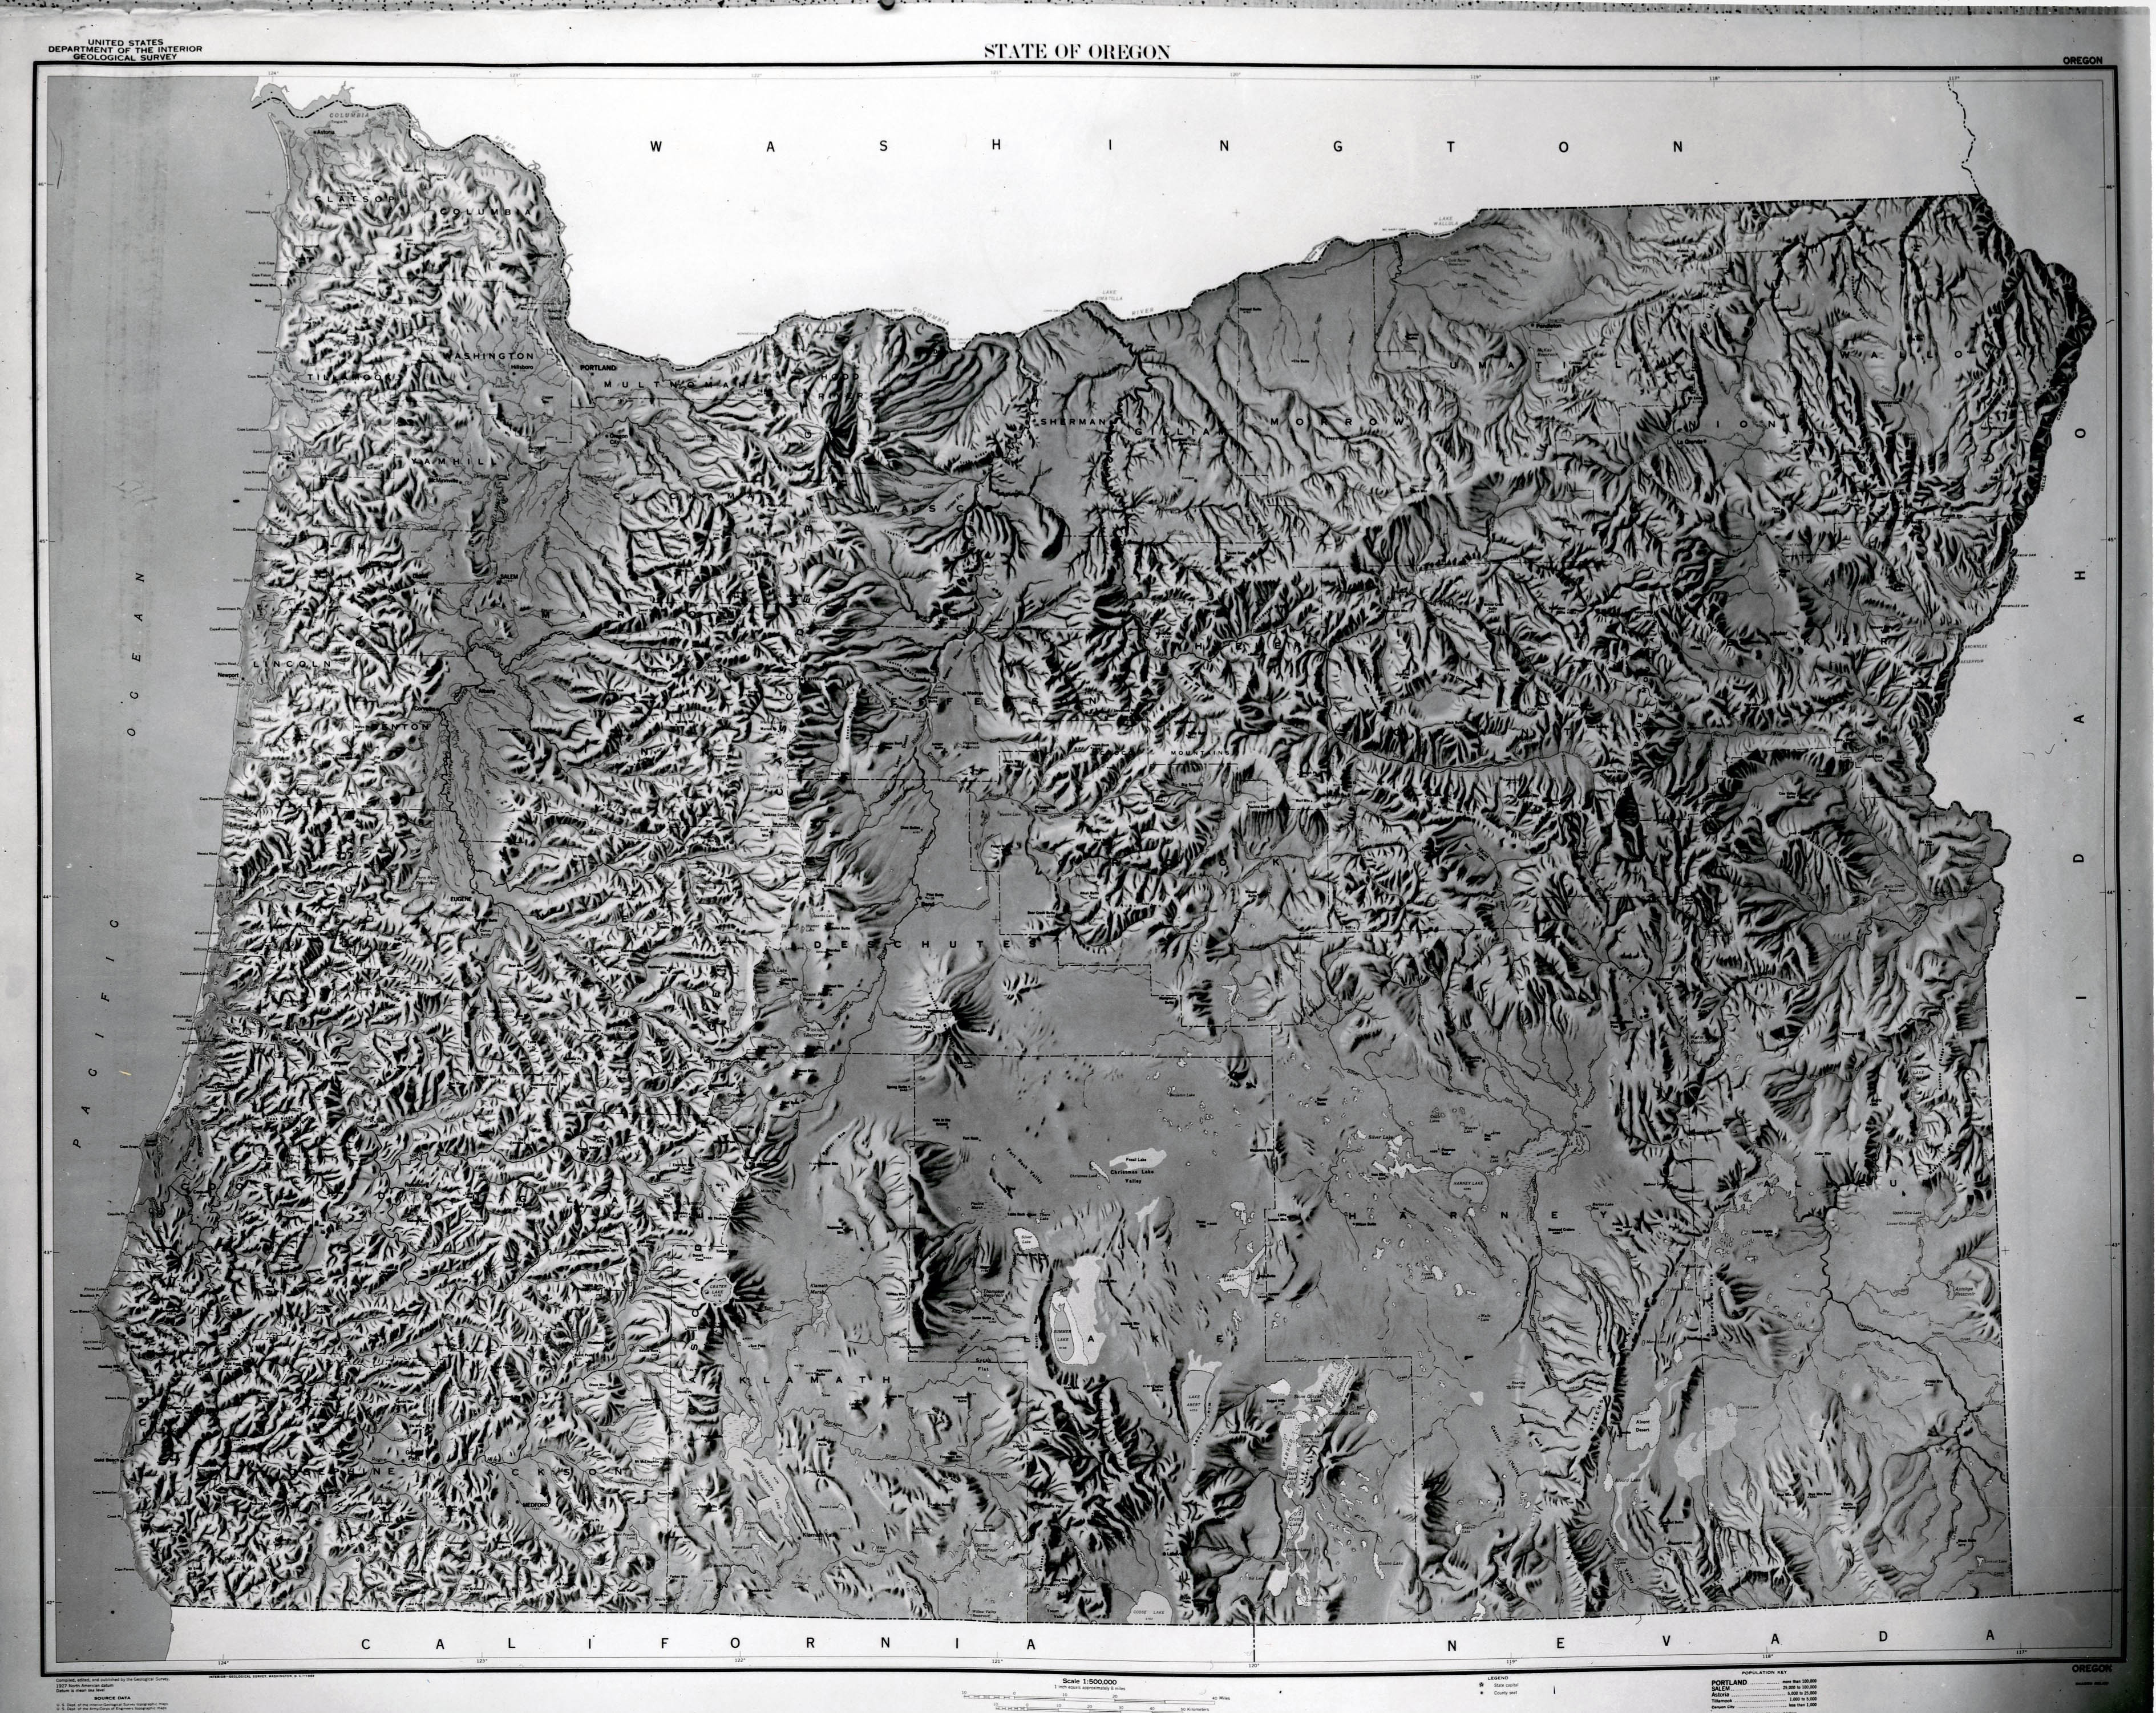 The molten rock supplies the volcanic arcs